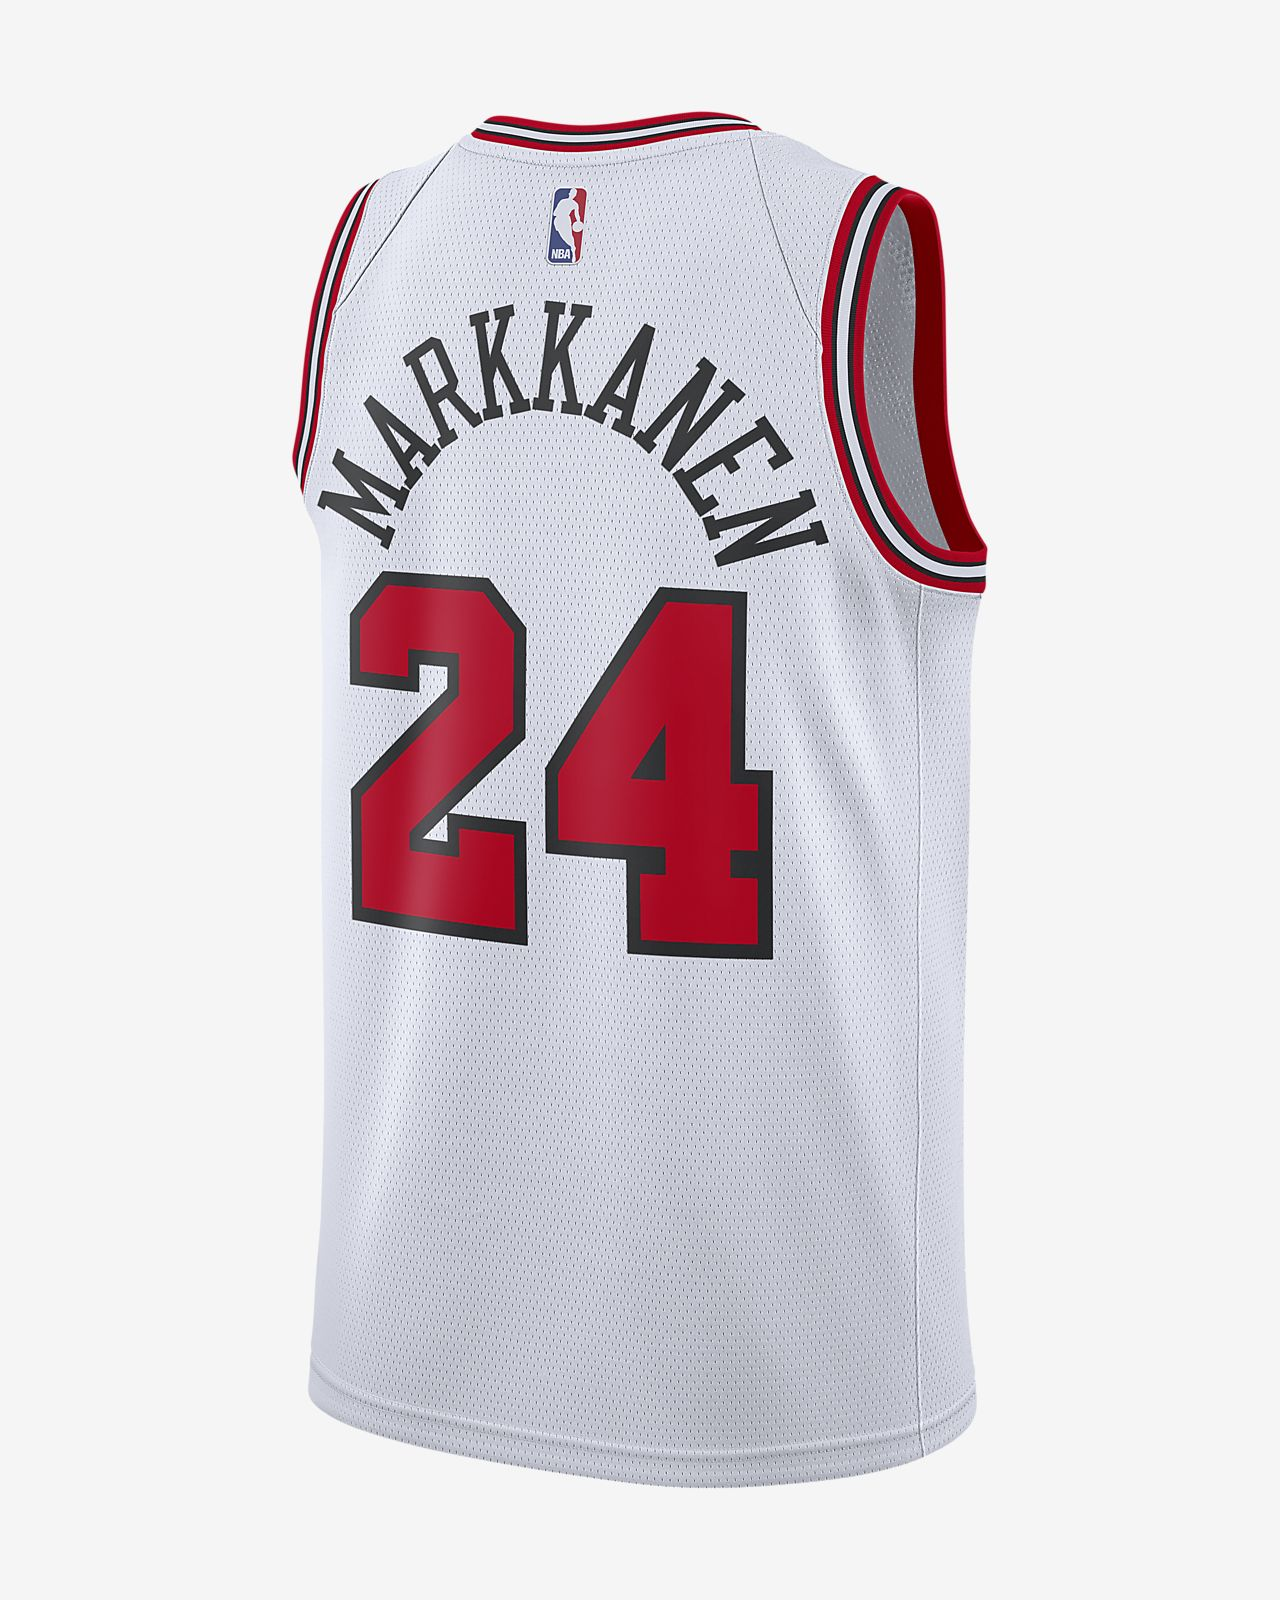 b4c5f56d178692 Men s Nike NBA Connected Jersey. Lauri Markkanen Association Edition  Swingman (Chicago Bulls)